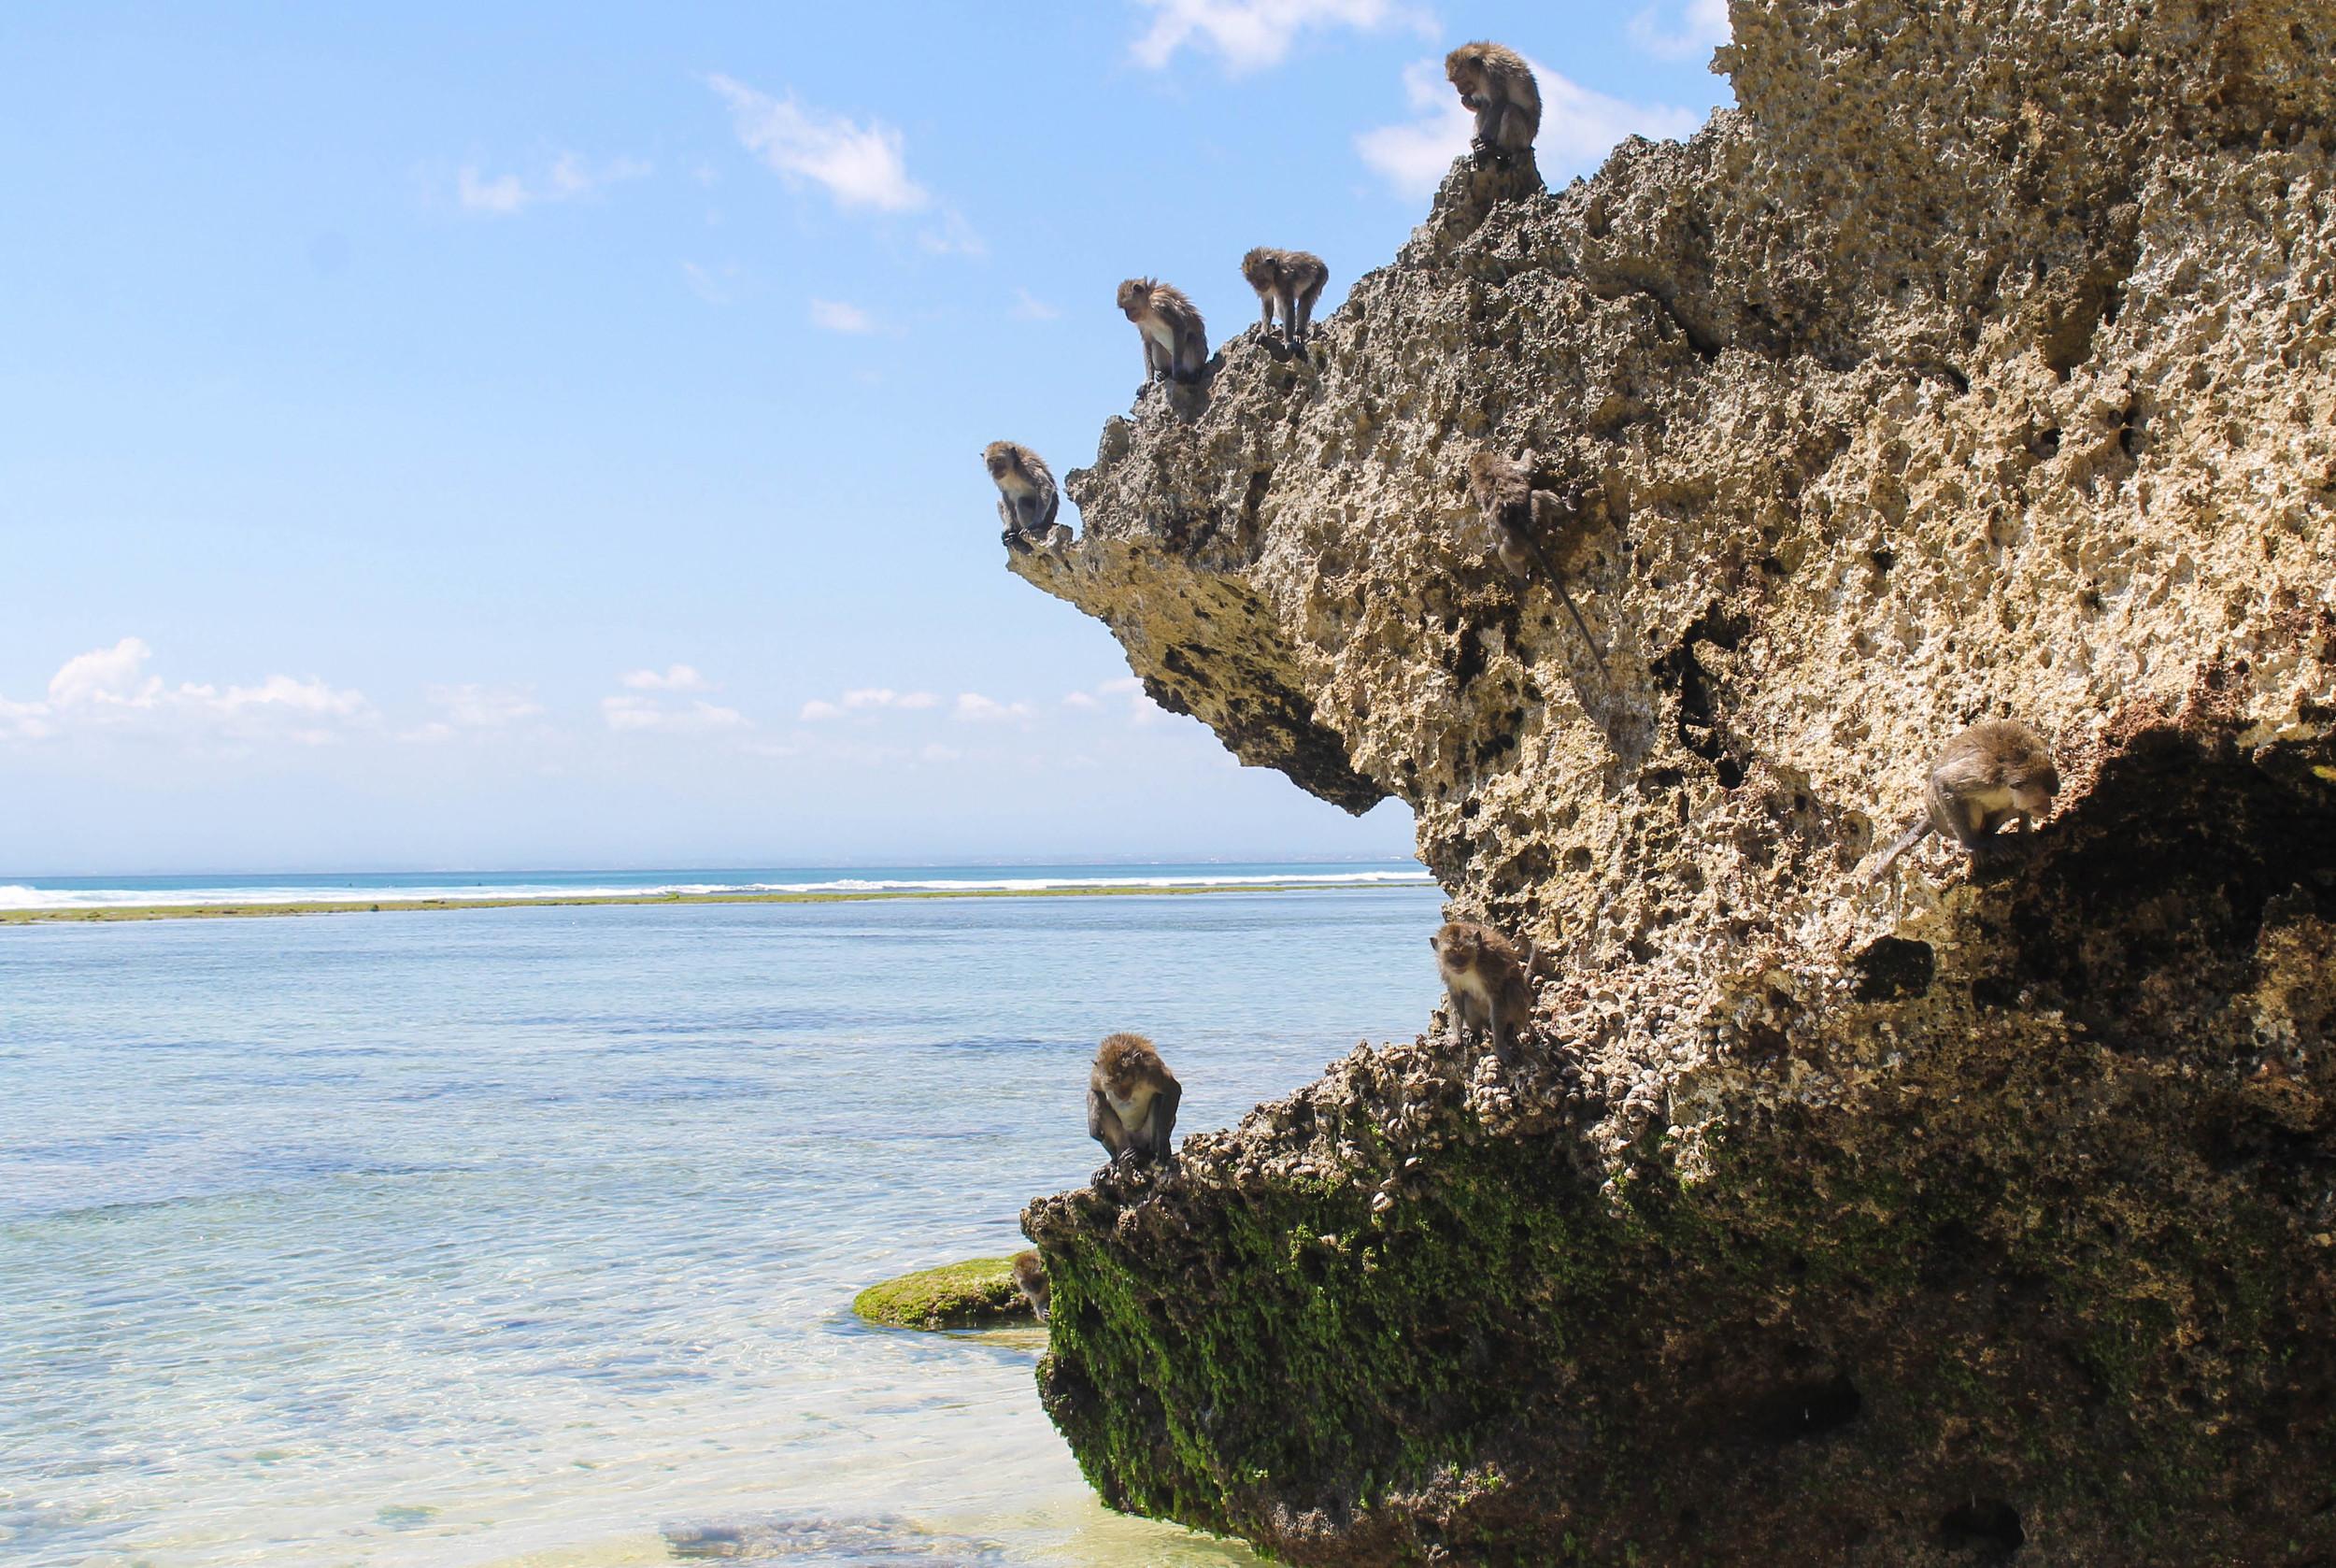 Monkeys at Padang Padang beach.